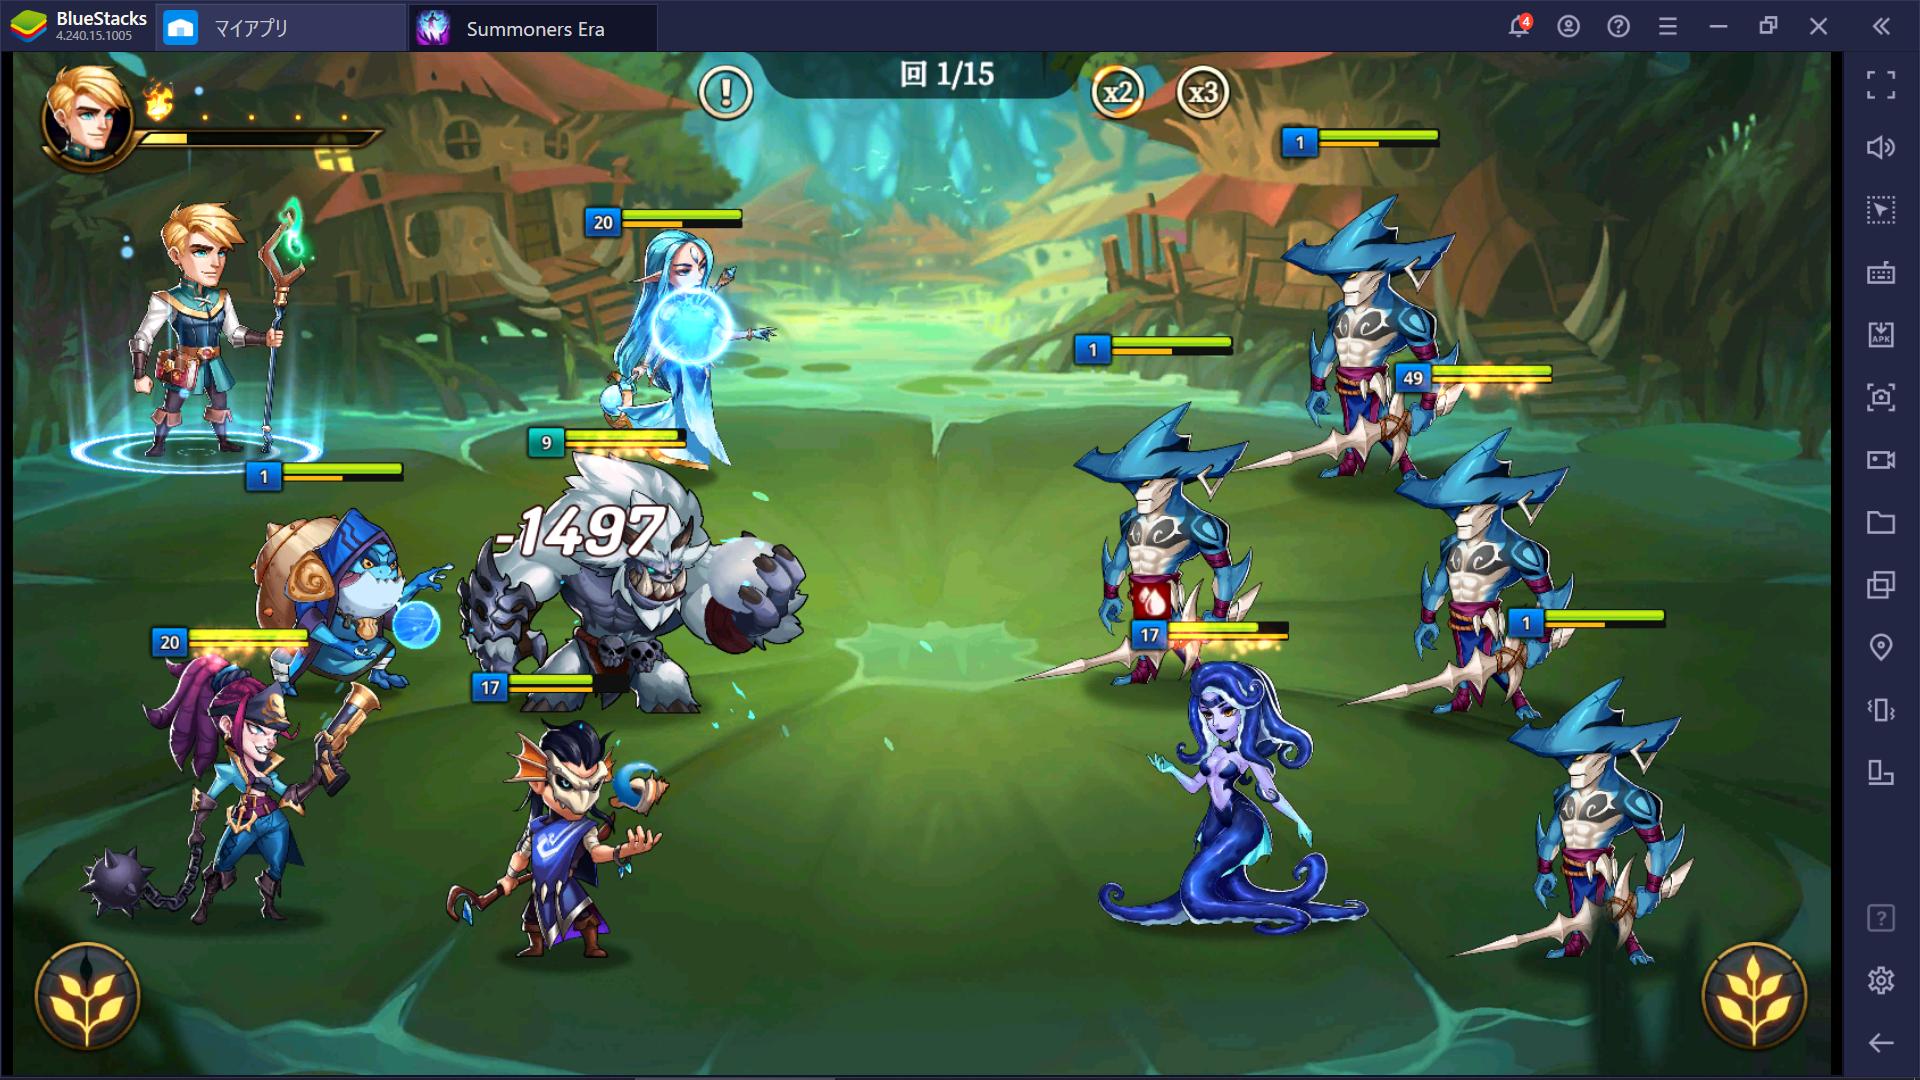 BlueStacksを使ってPCで『Summoners Era – Arena of Heroes』を遊ぼう